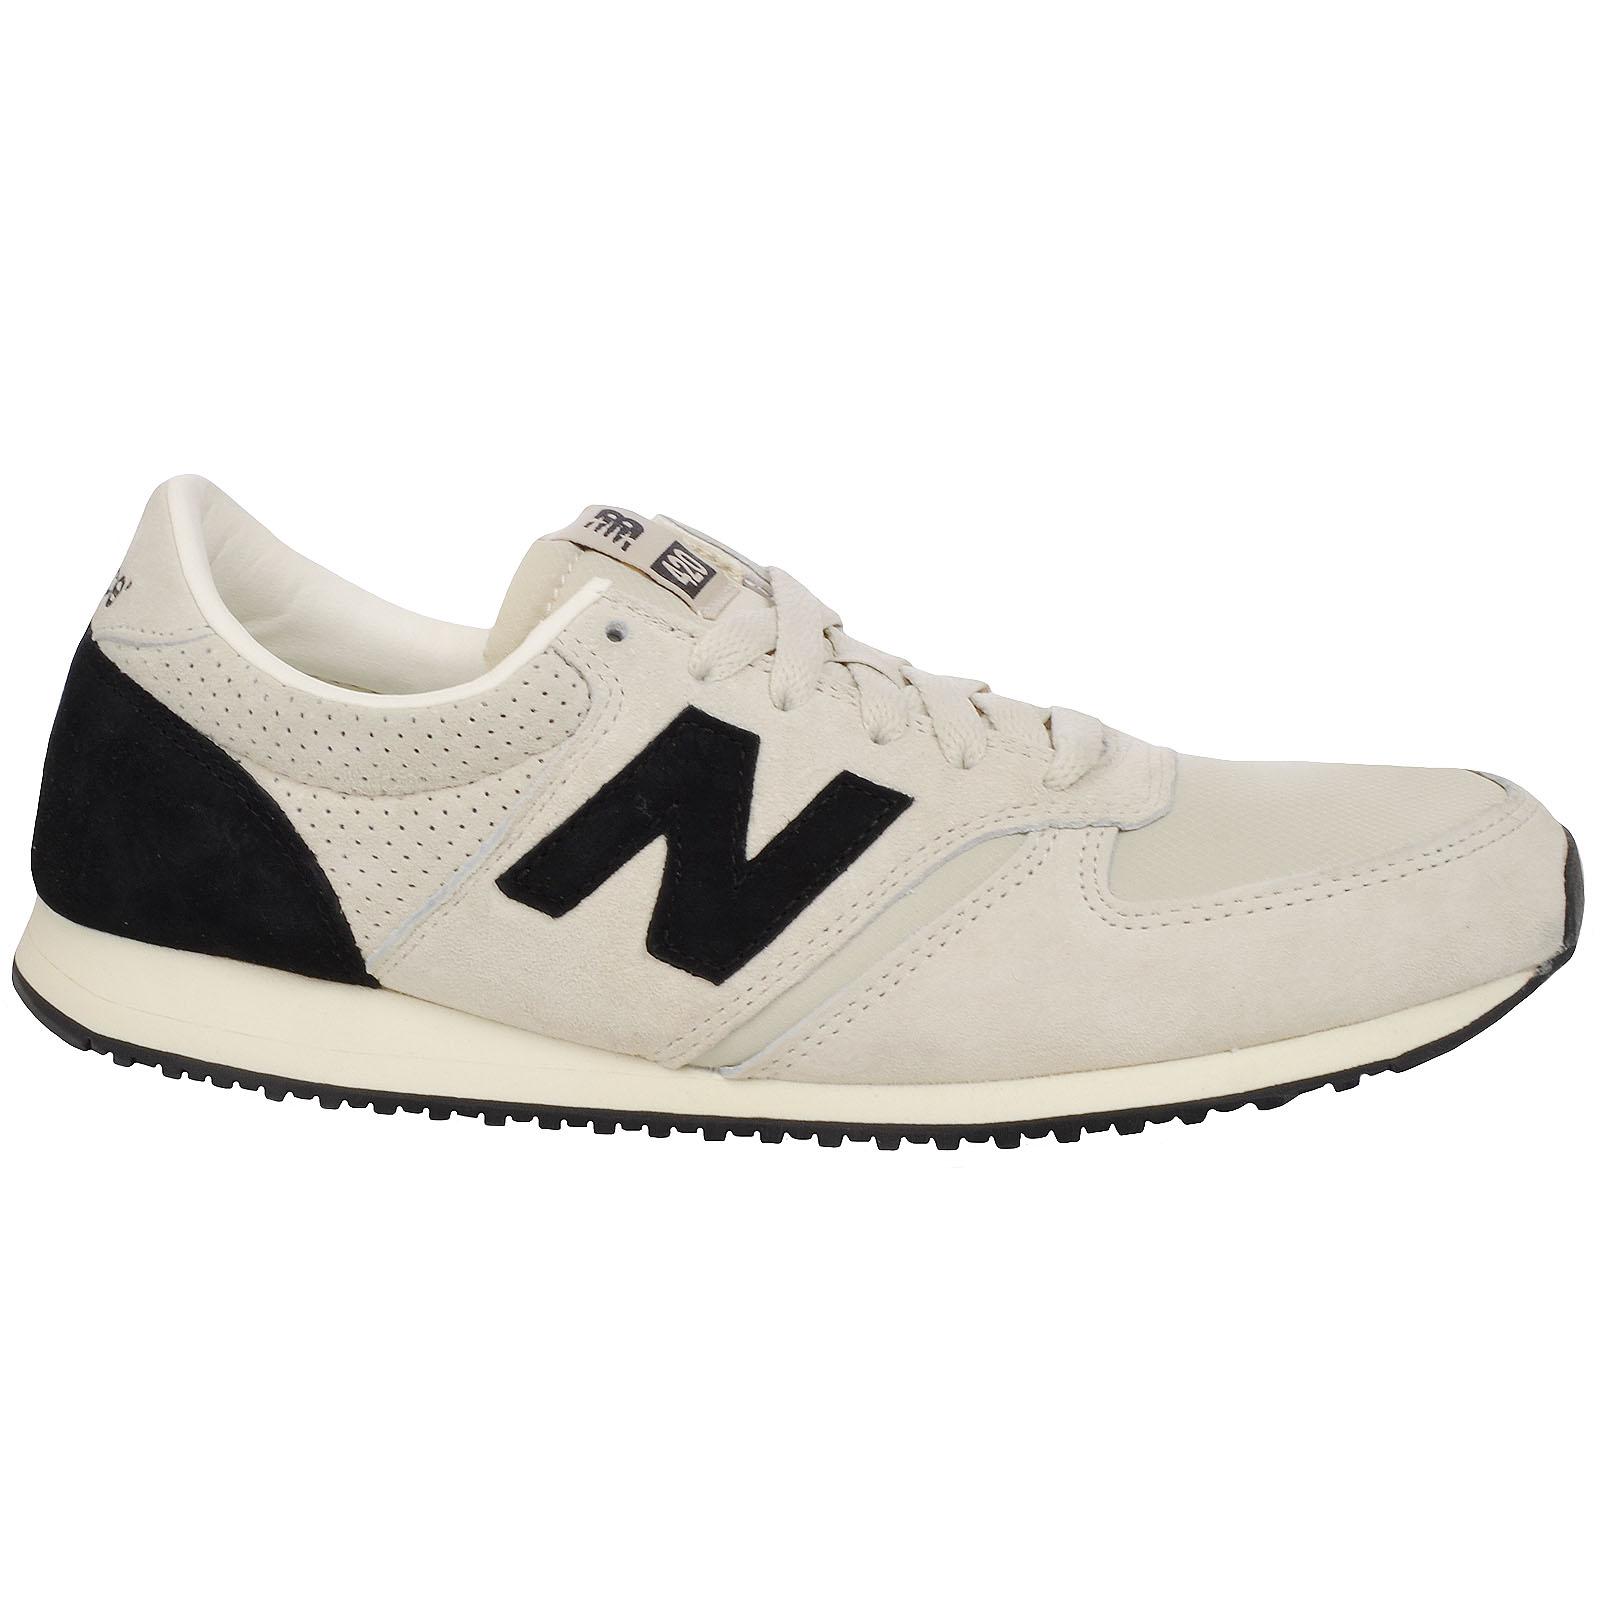 new balance nb 420